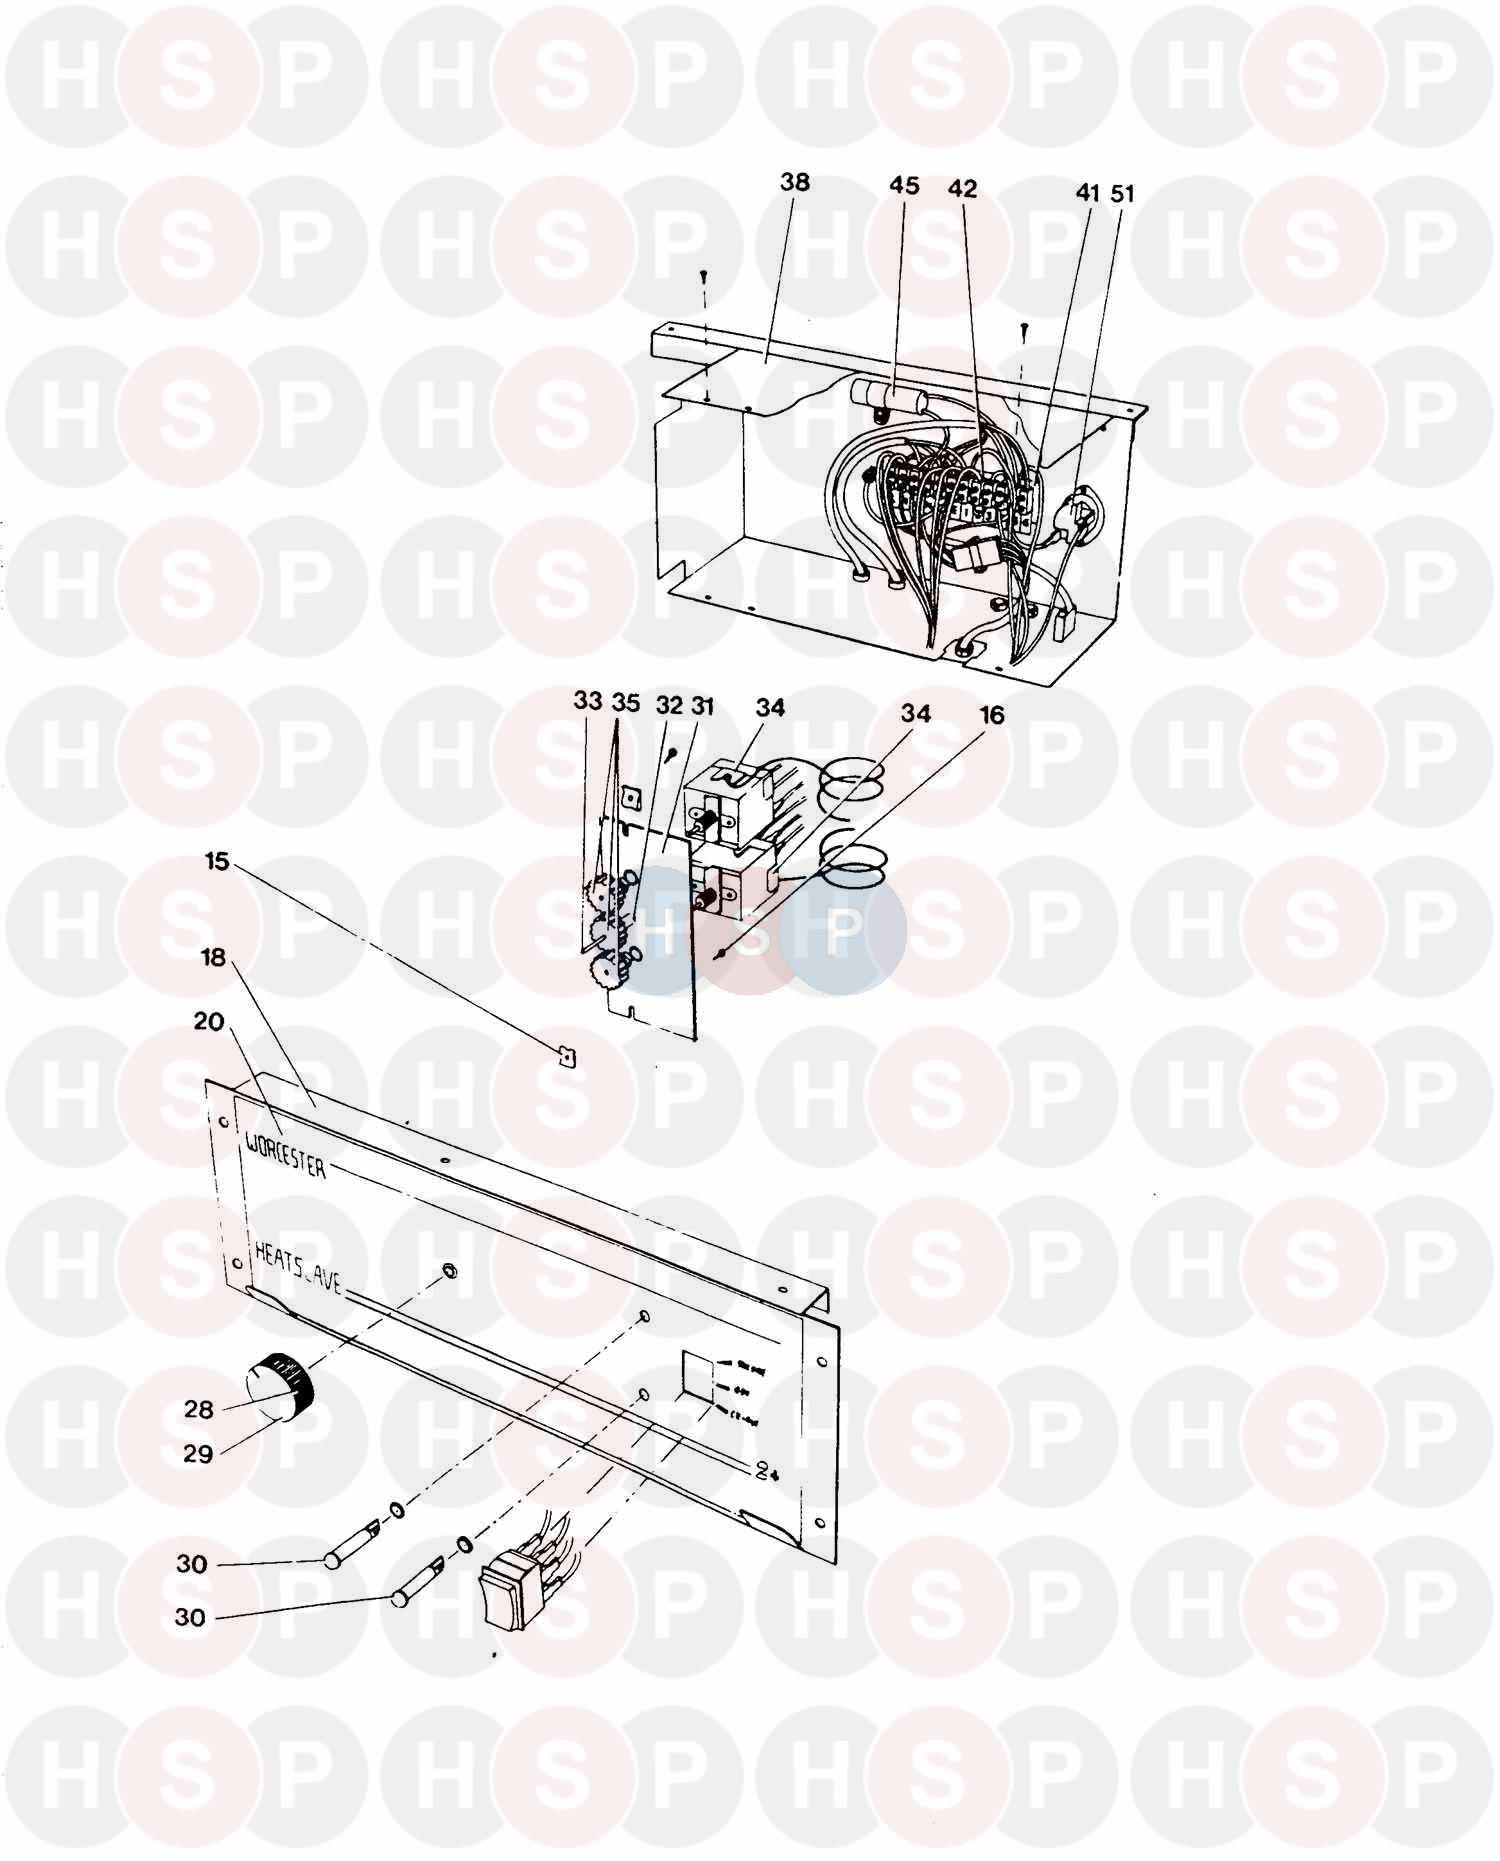 Worcester HEATSLAVE 2 + G40 BF DELUXE Appliance Diagram